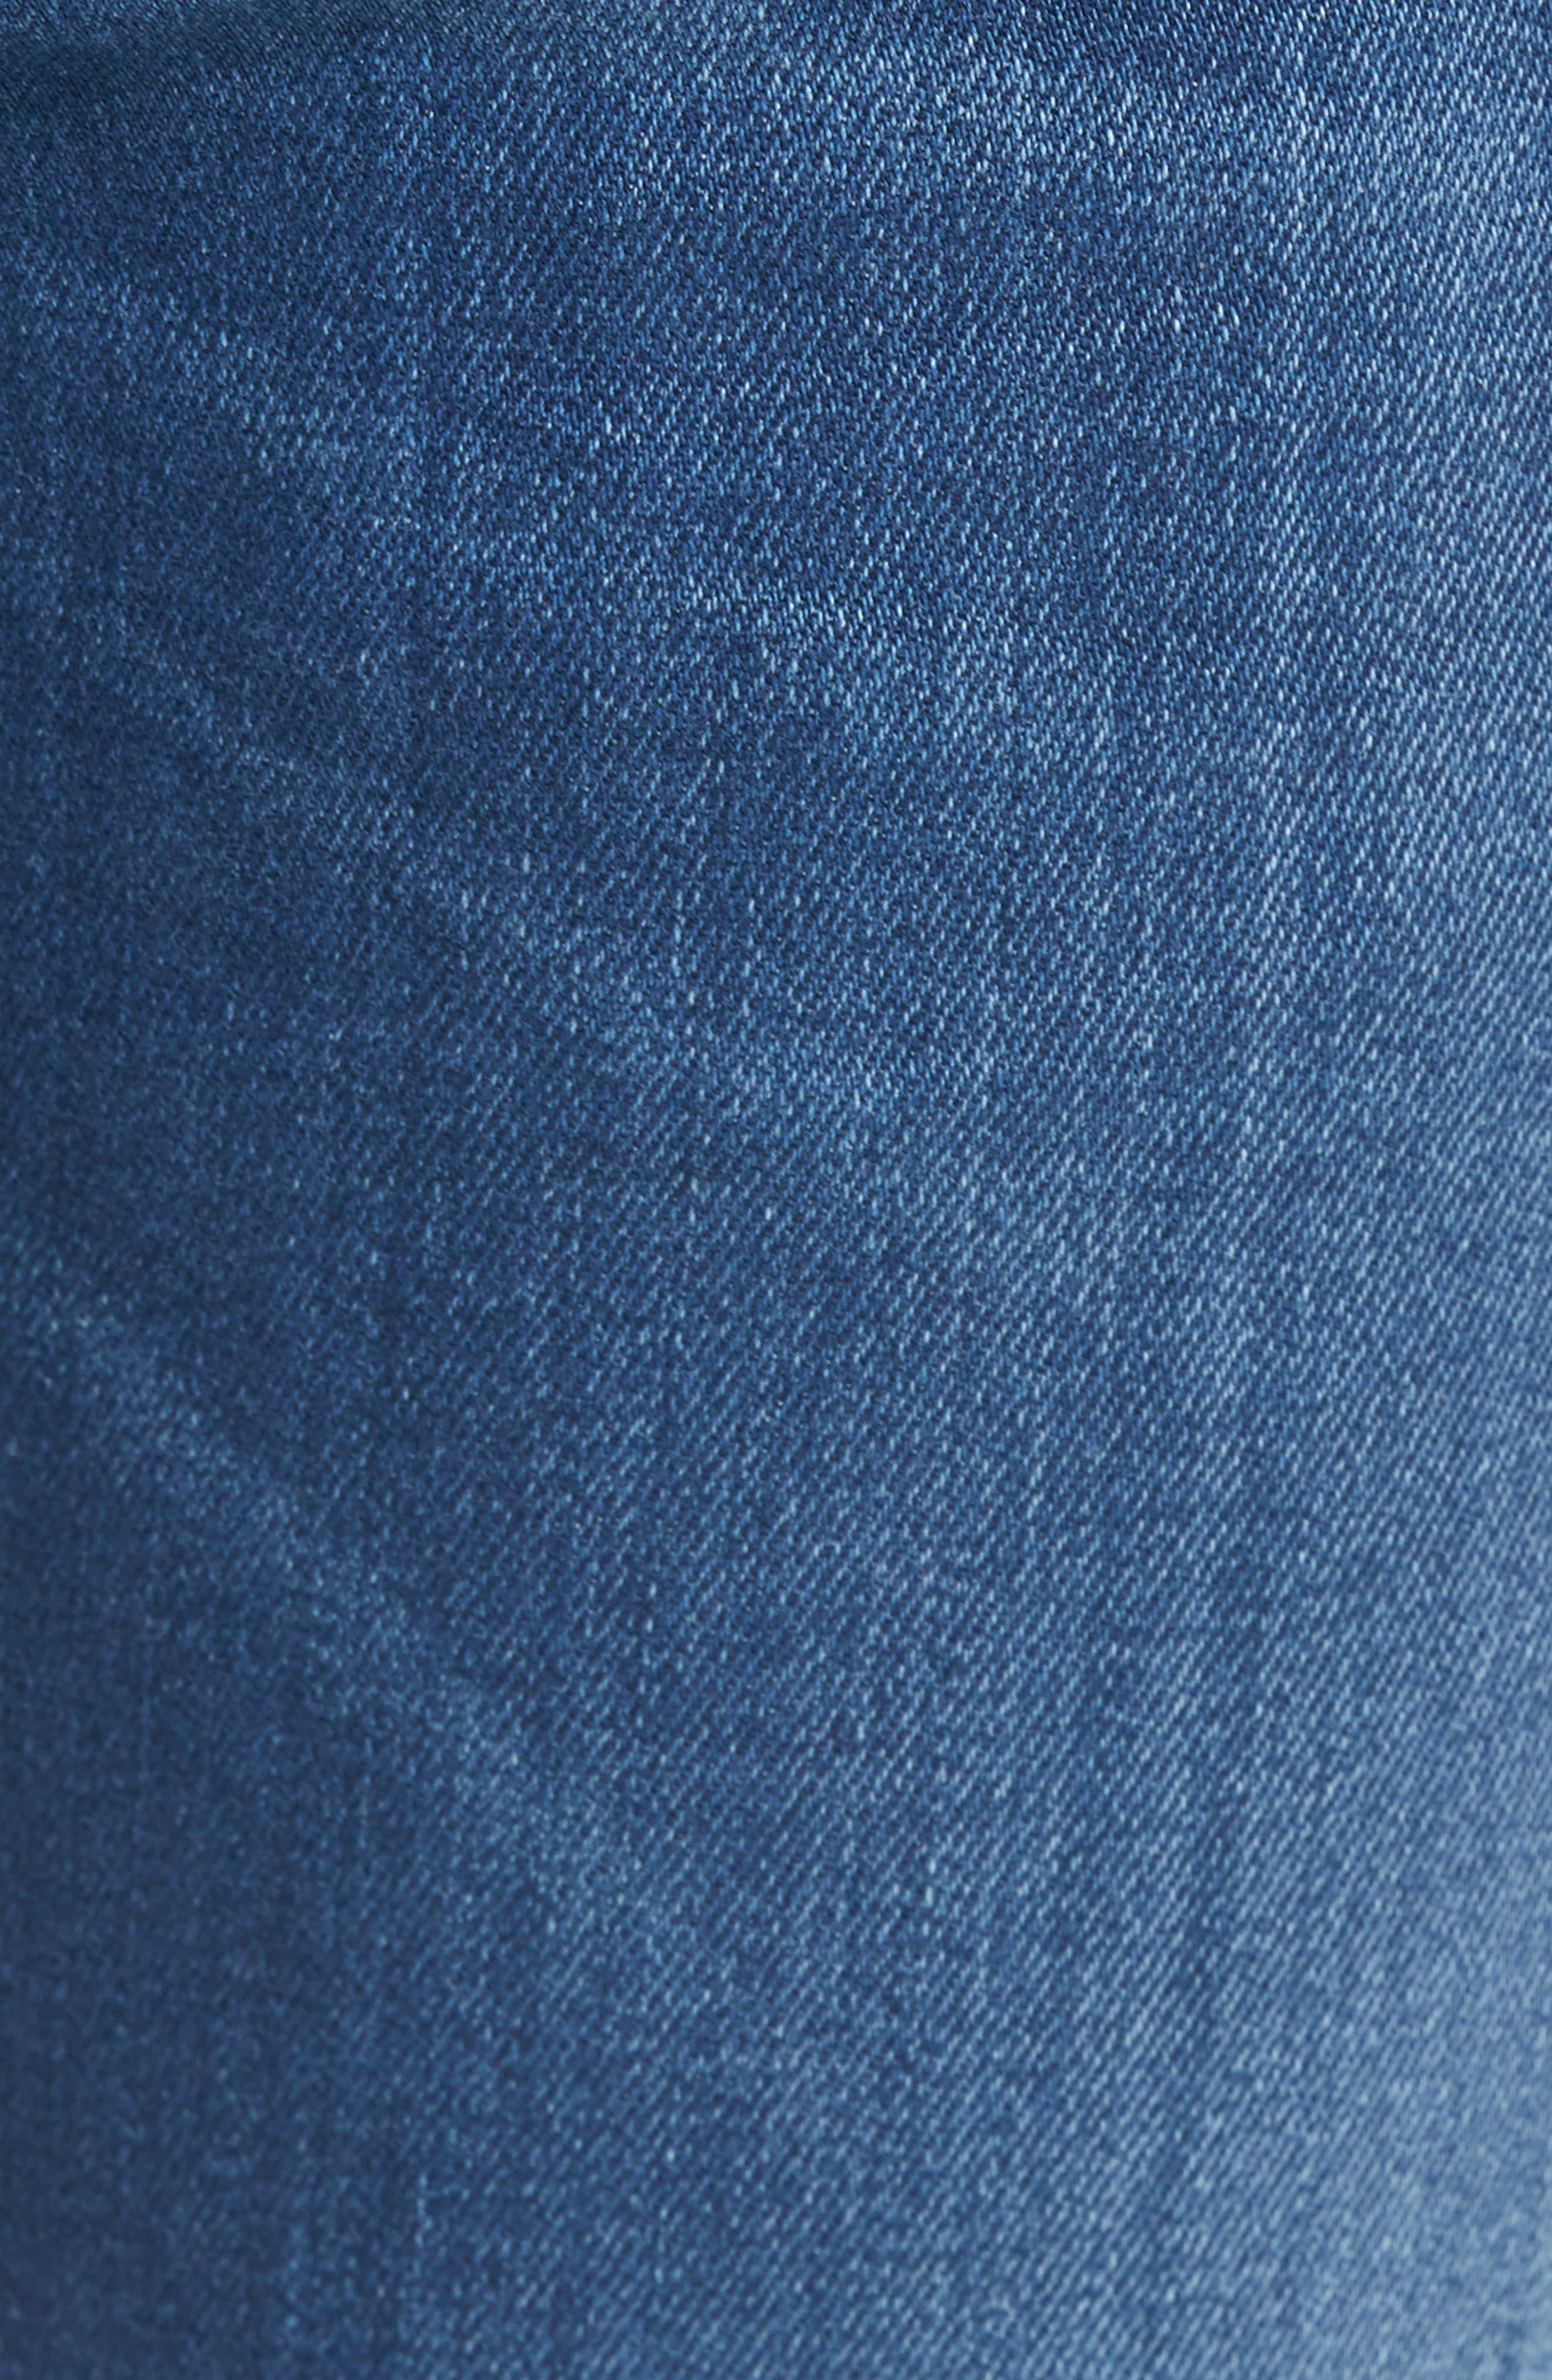 Zatiny Bootcut Jeans,                             Alternate thumbnail 5, color,                             Denim